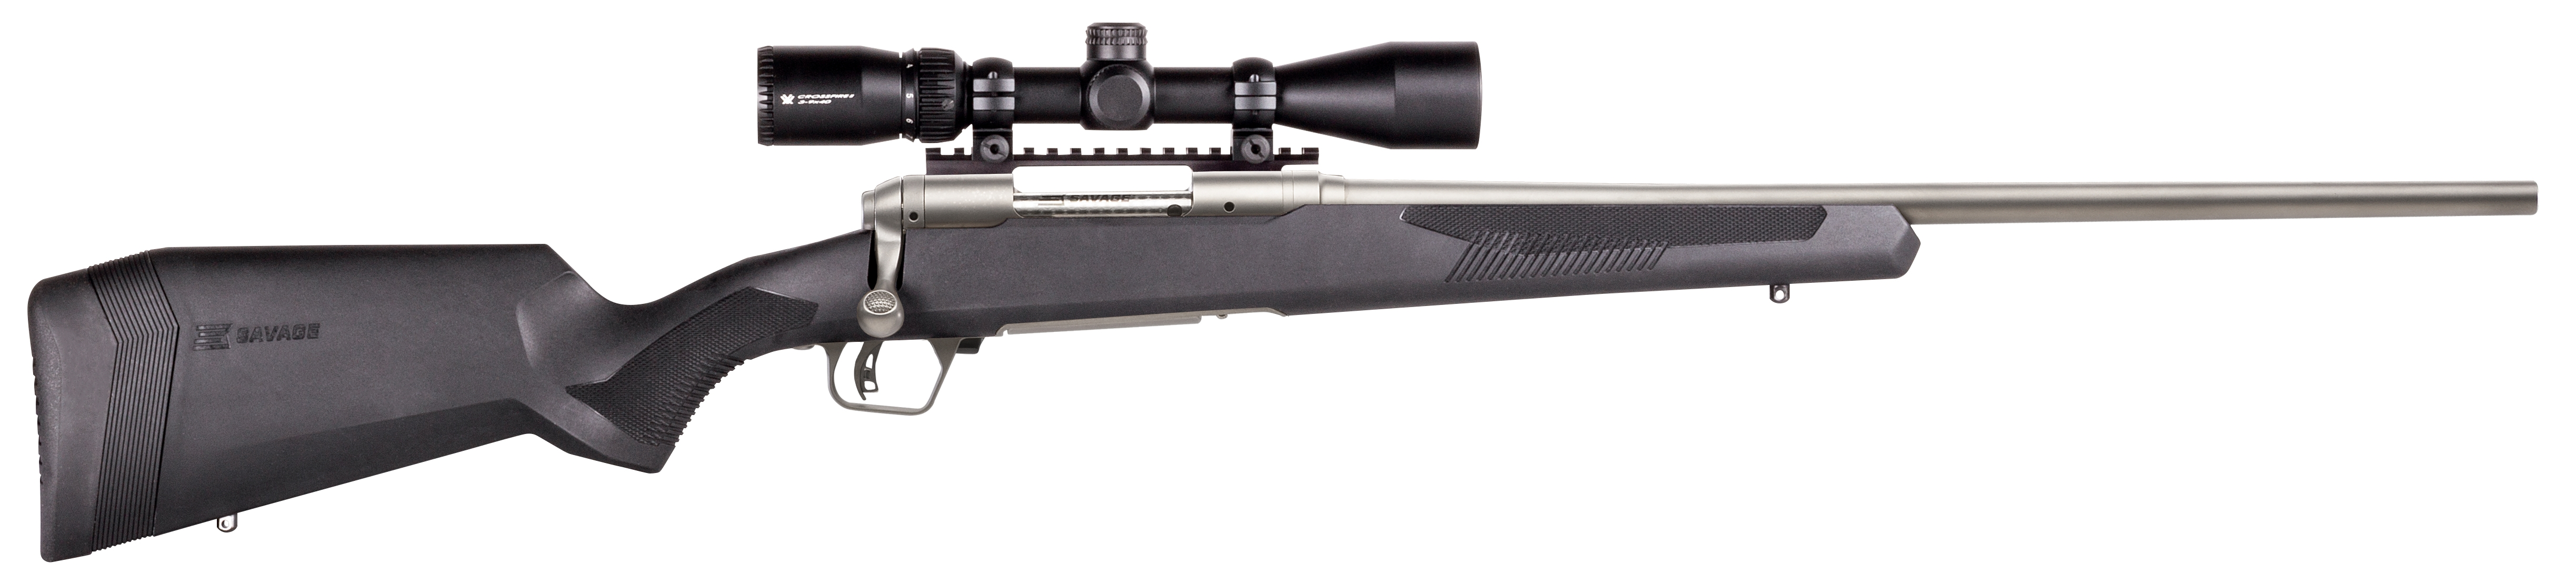 Savage Arms 110 Apex Storm XP 270 WSM